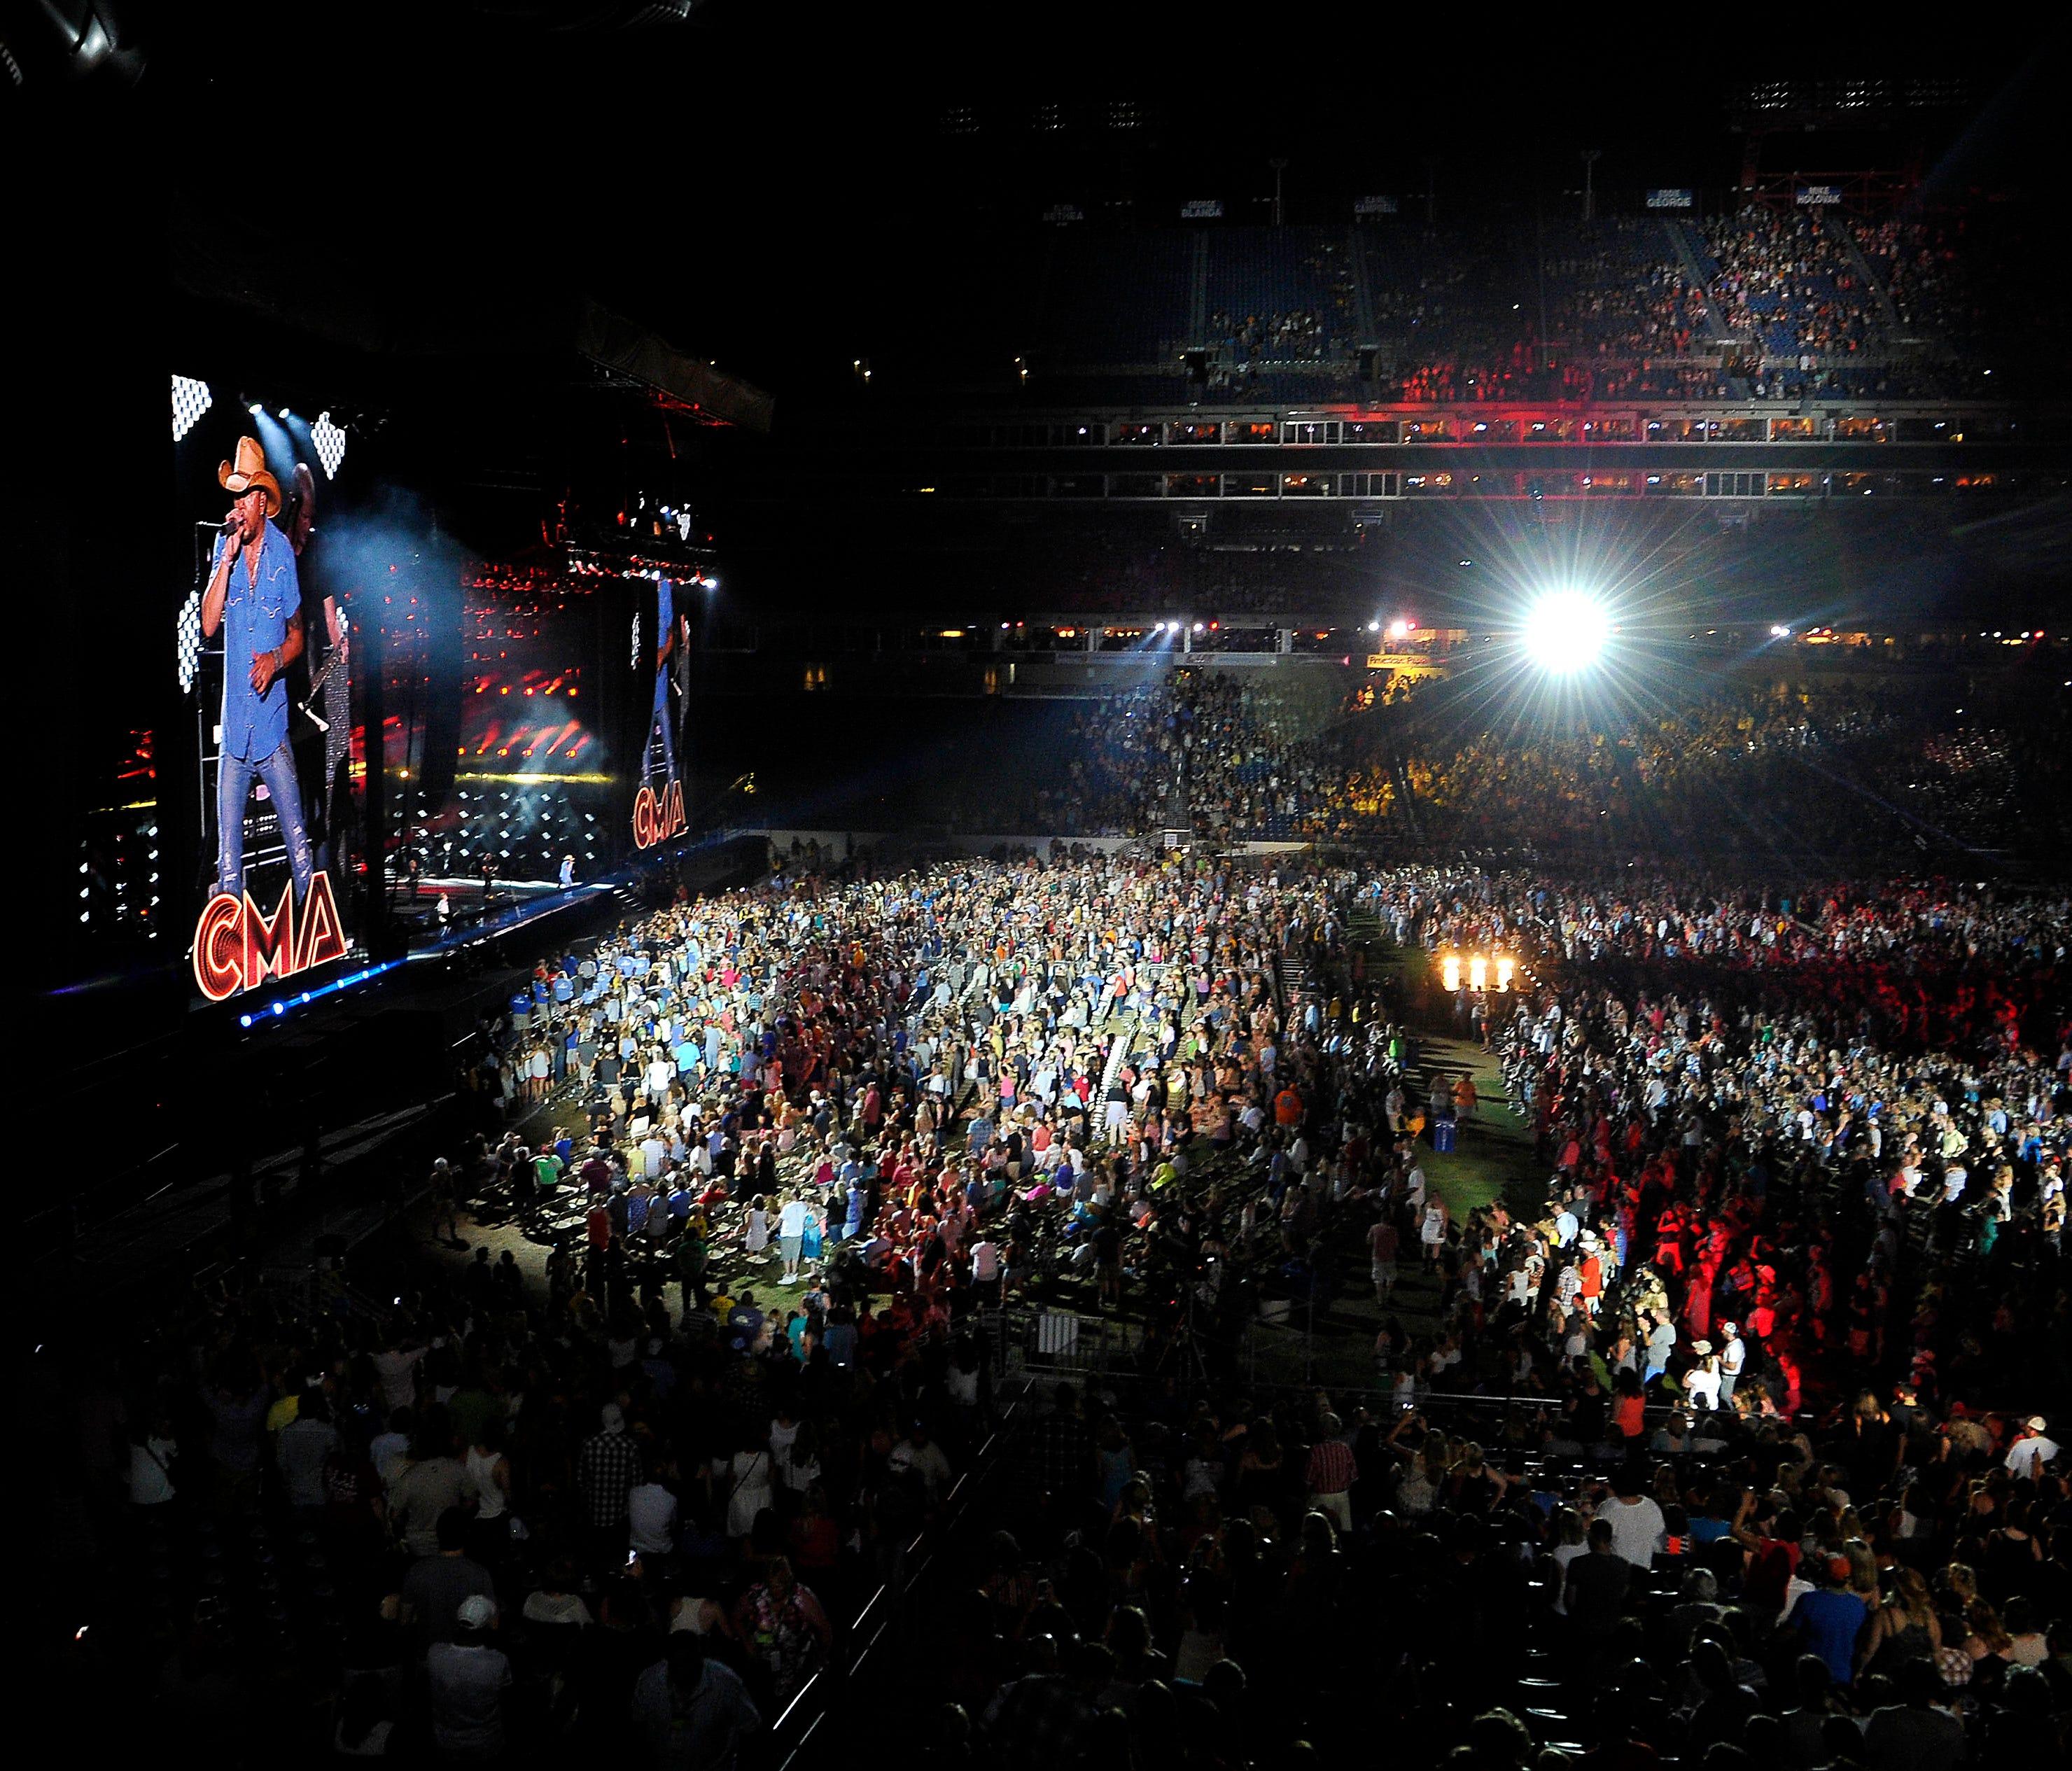 Cma Fest Becomes Nashville Music Financial Superstar Wfmynews2